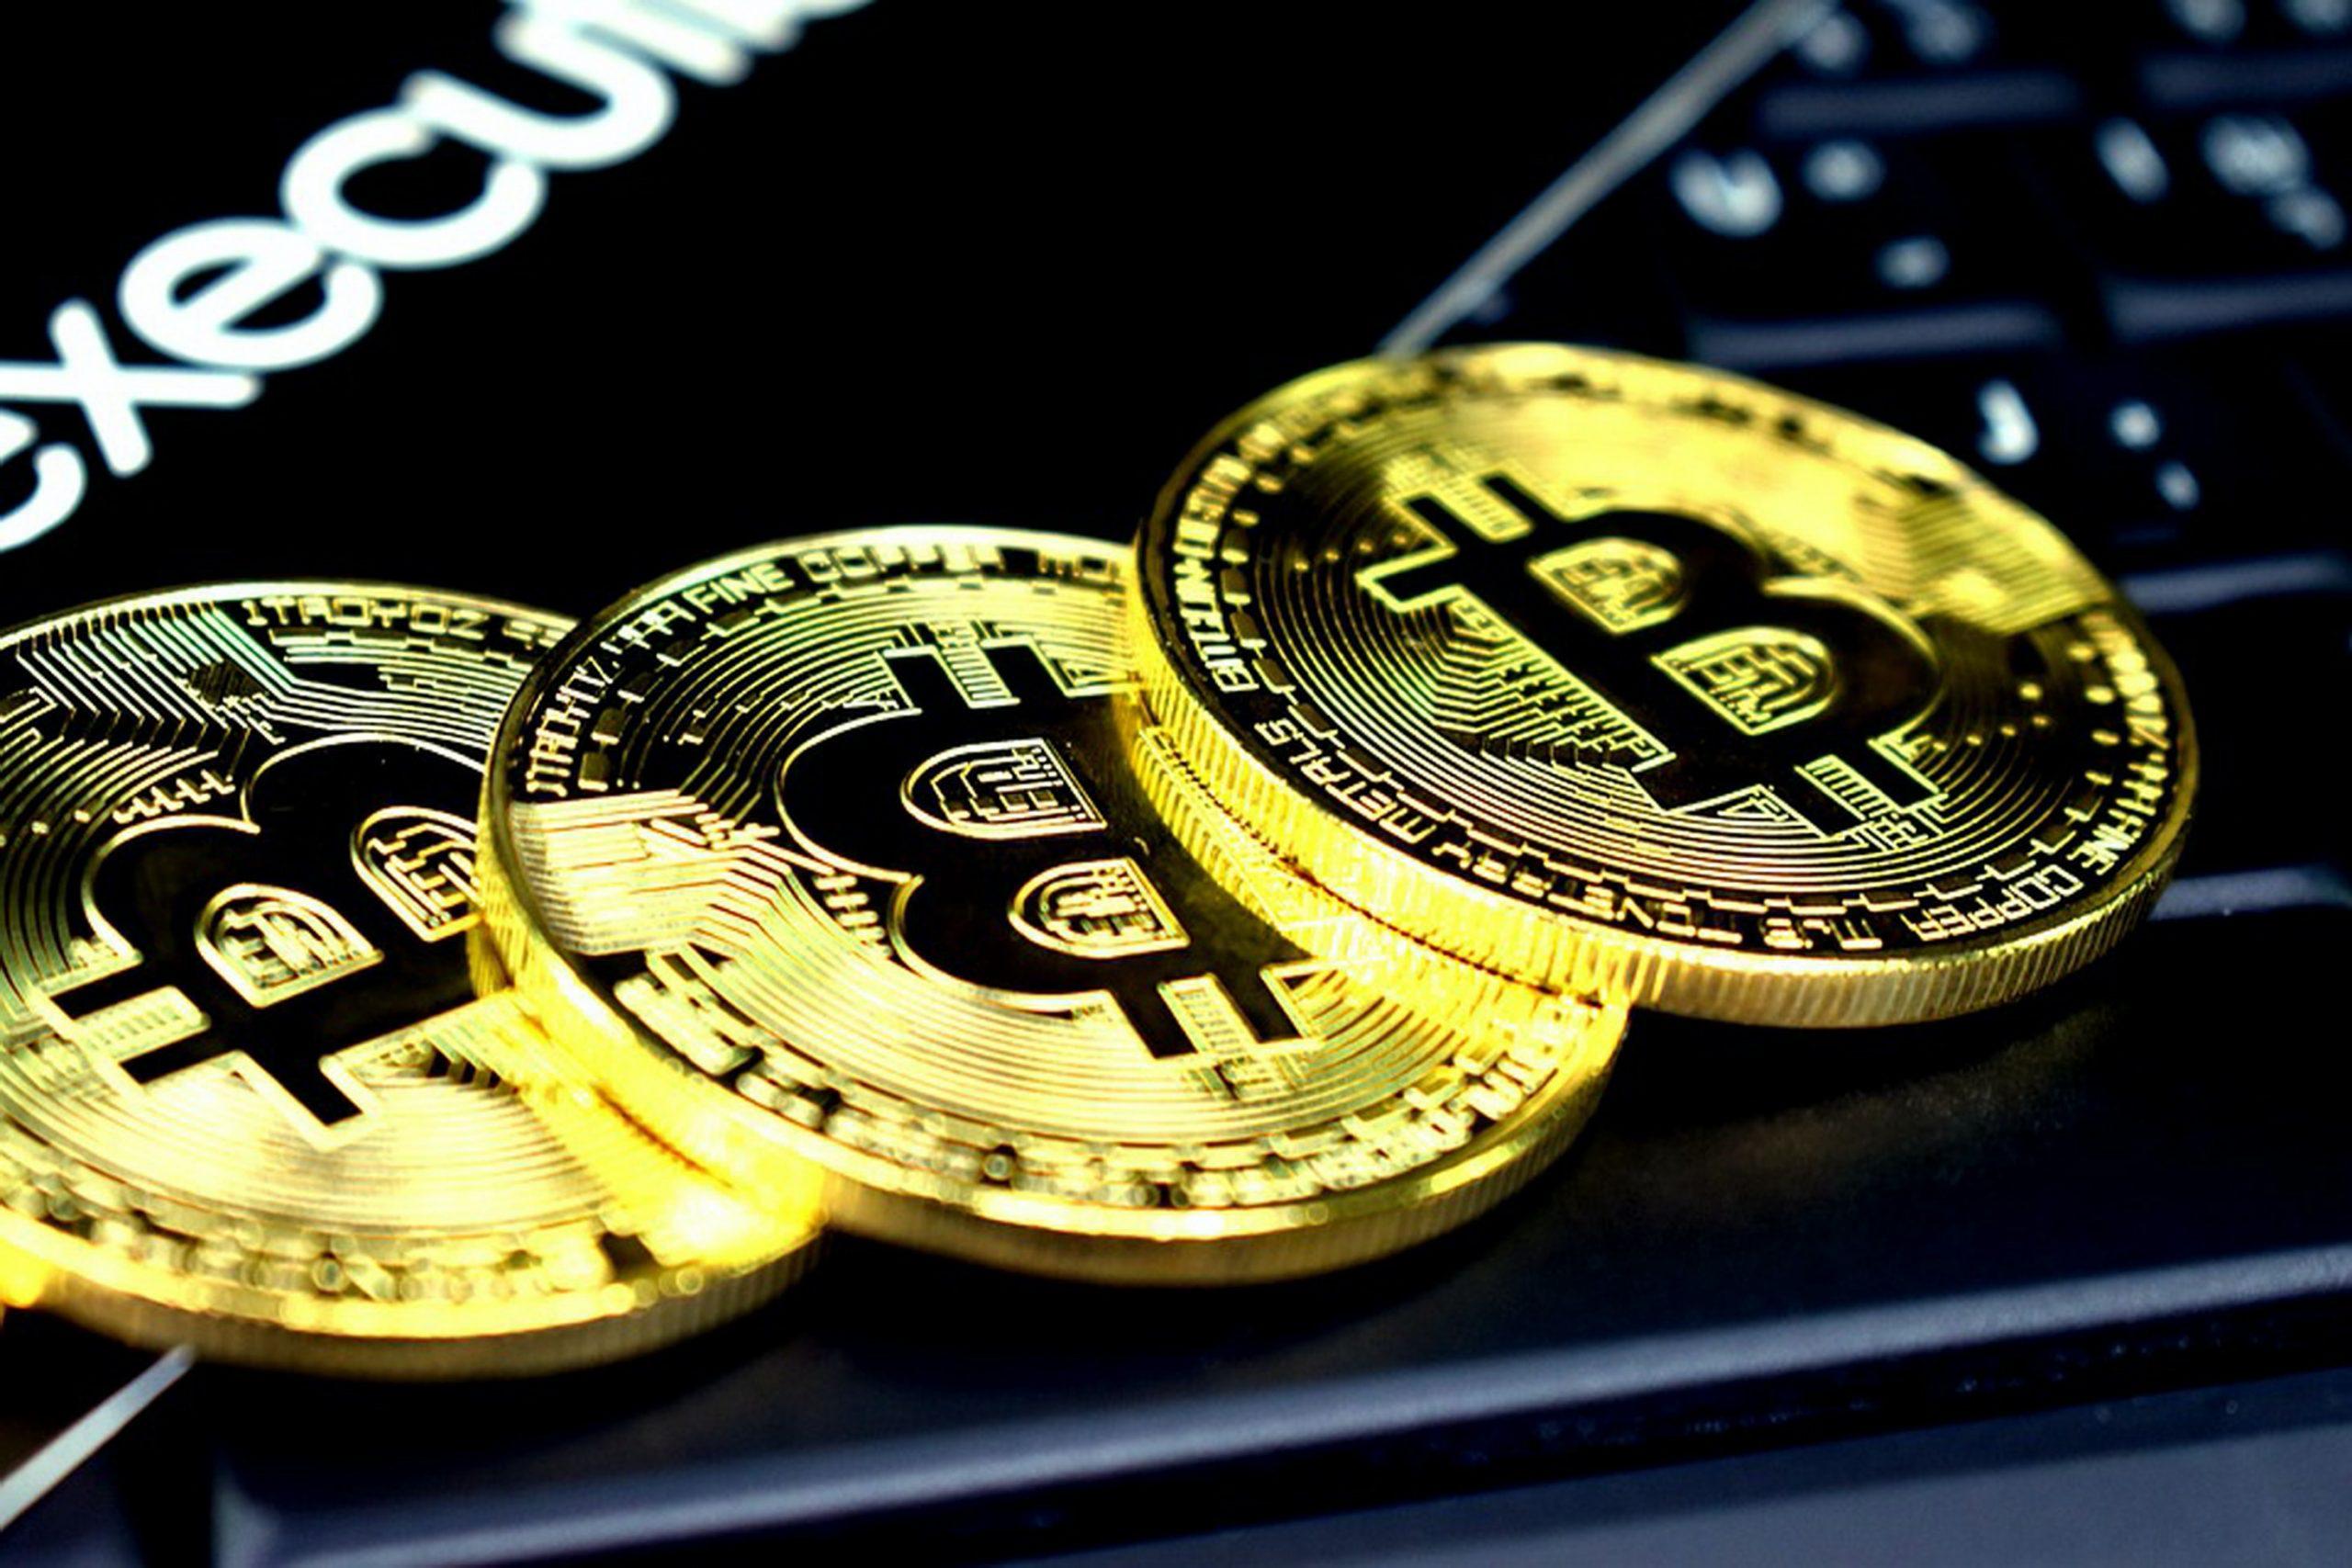 Bitcoin hits $10k